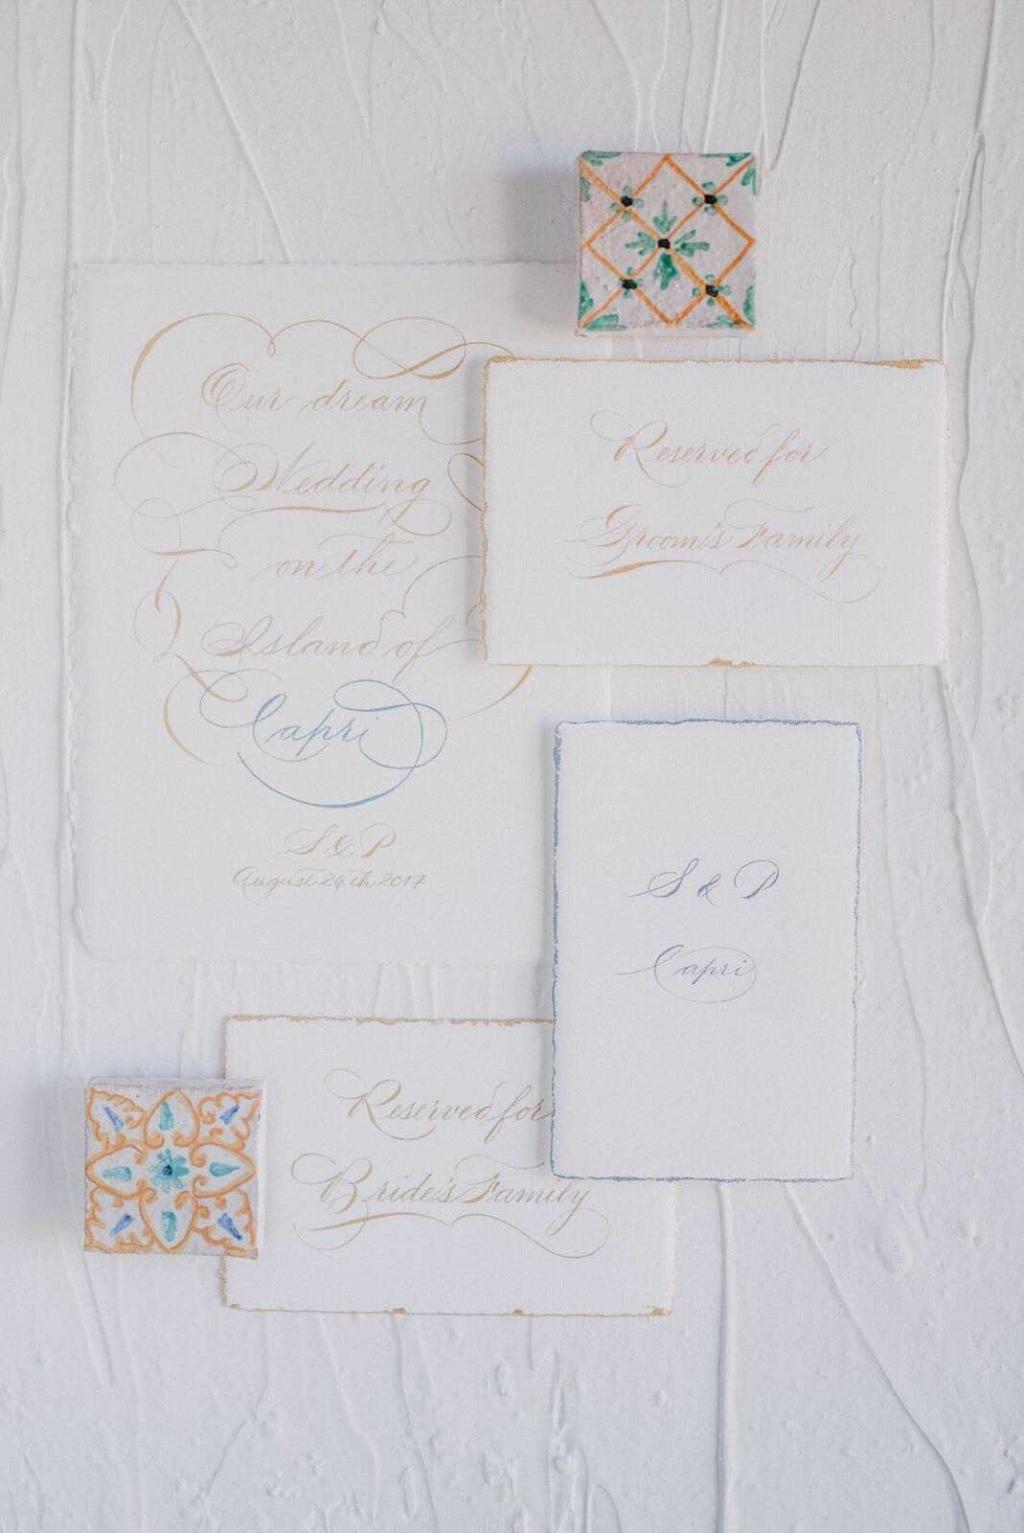 An all-white sophisticated destination wedding in Capri - Il Riccio beach club